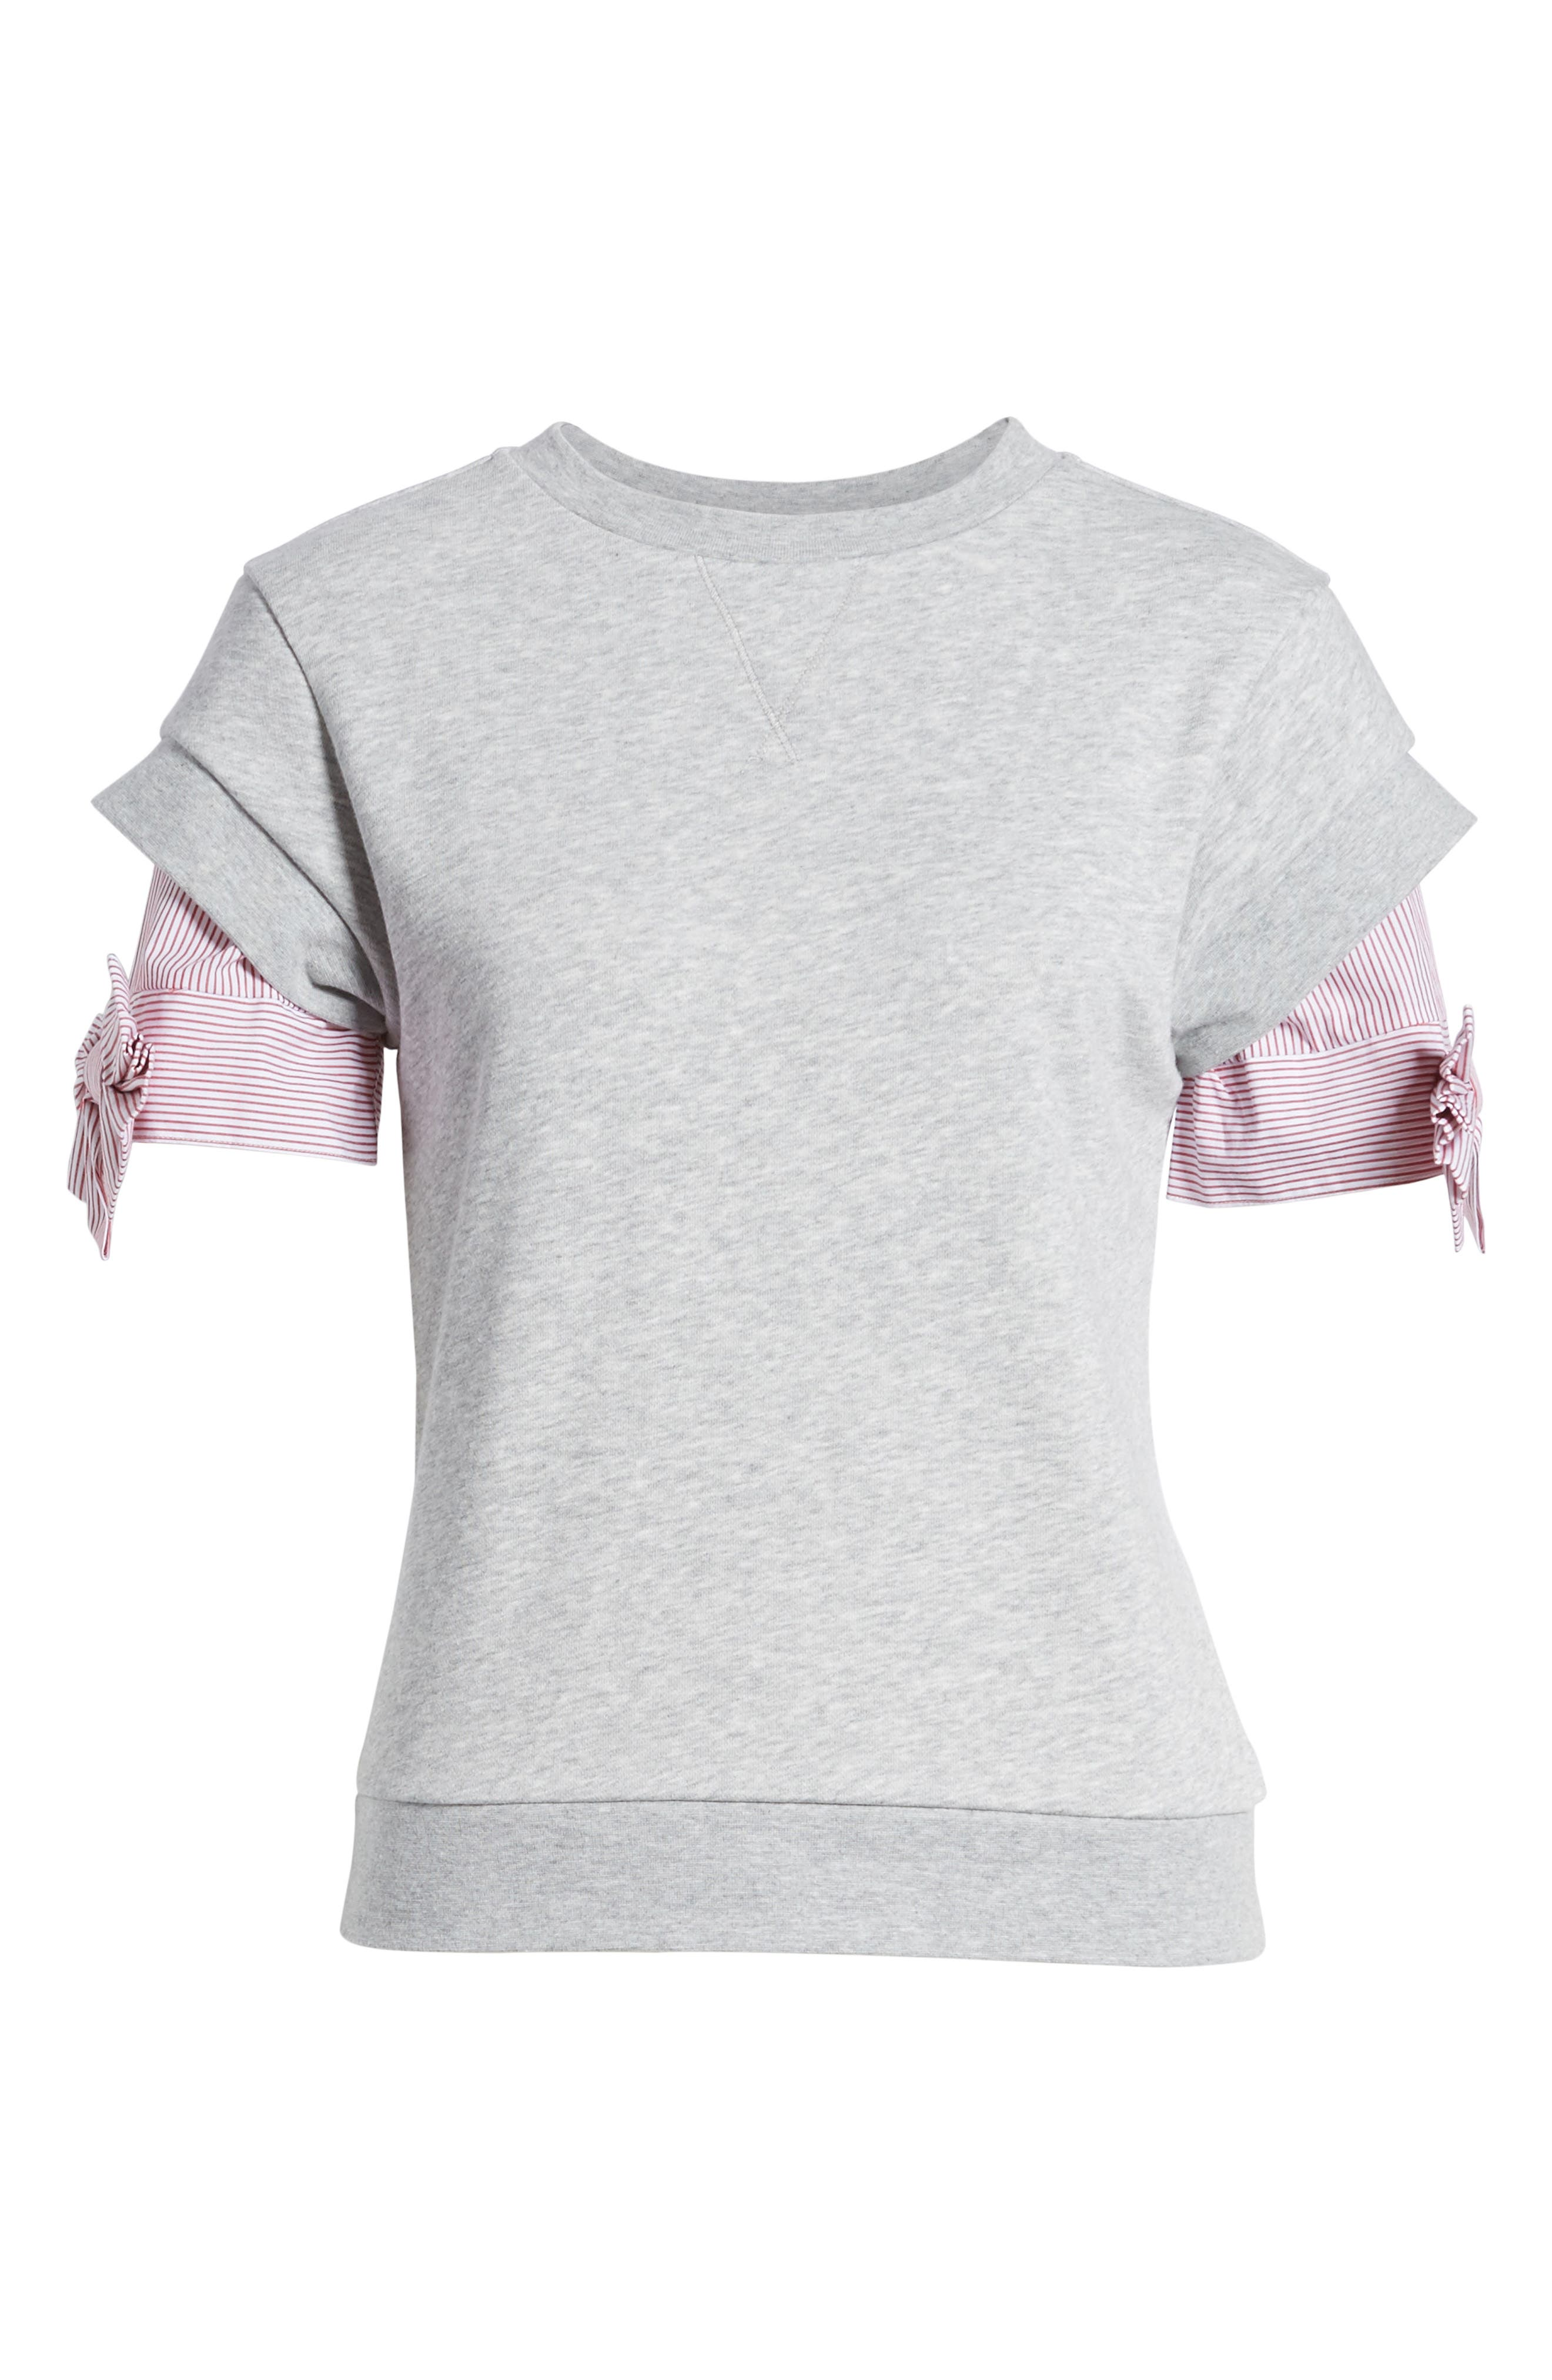 Bow Sleeve Sweatshirt,                             Alternate thumbnail 6, color,                             030